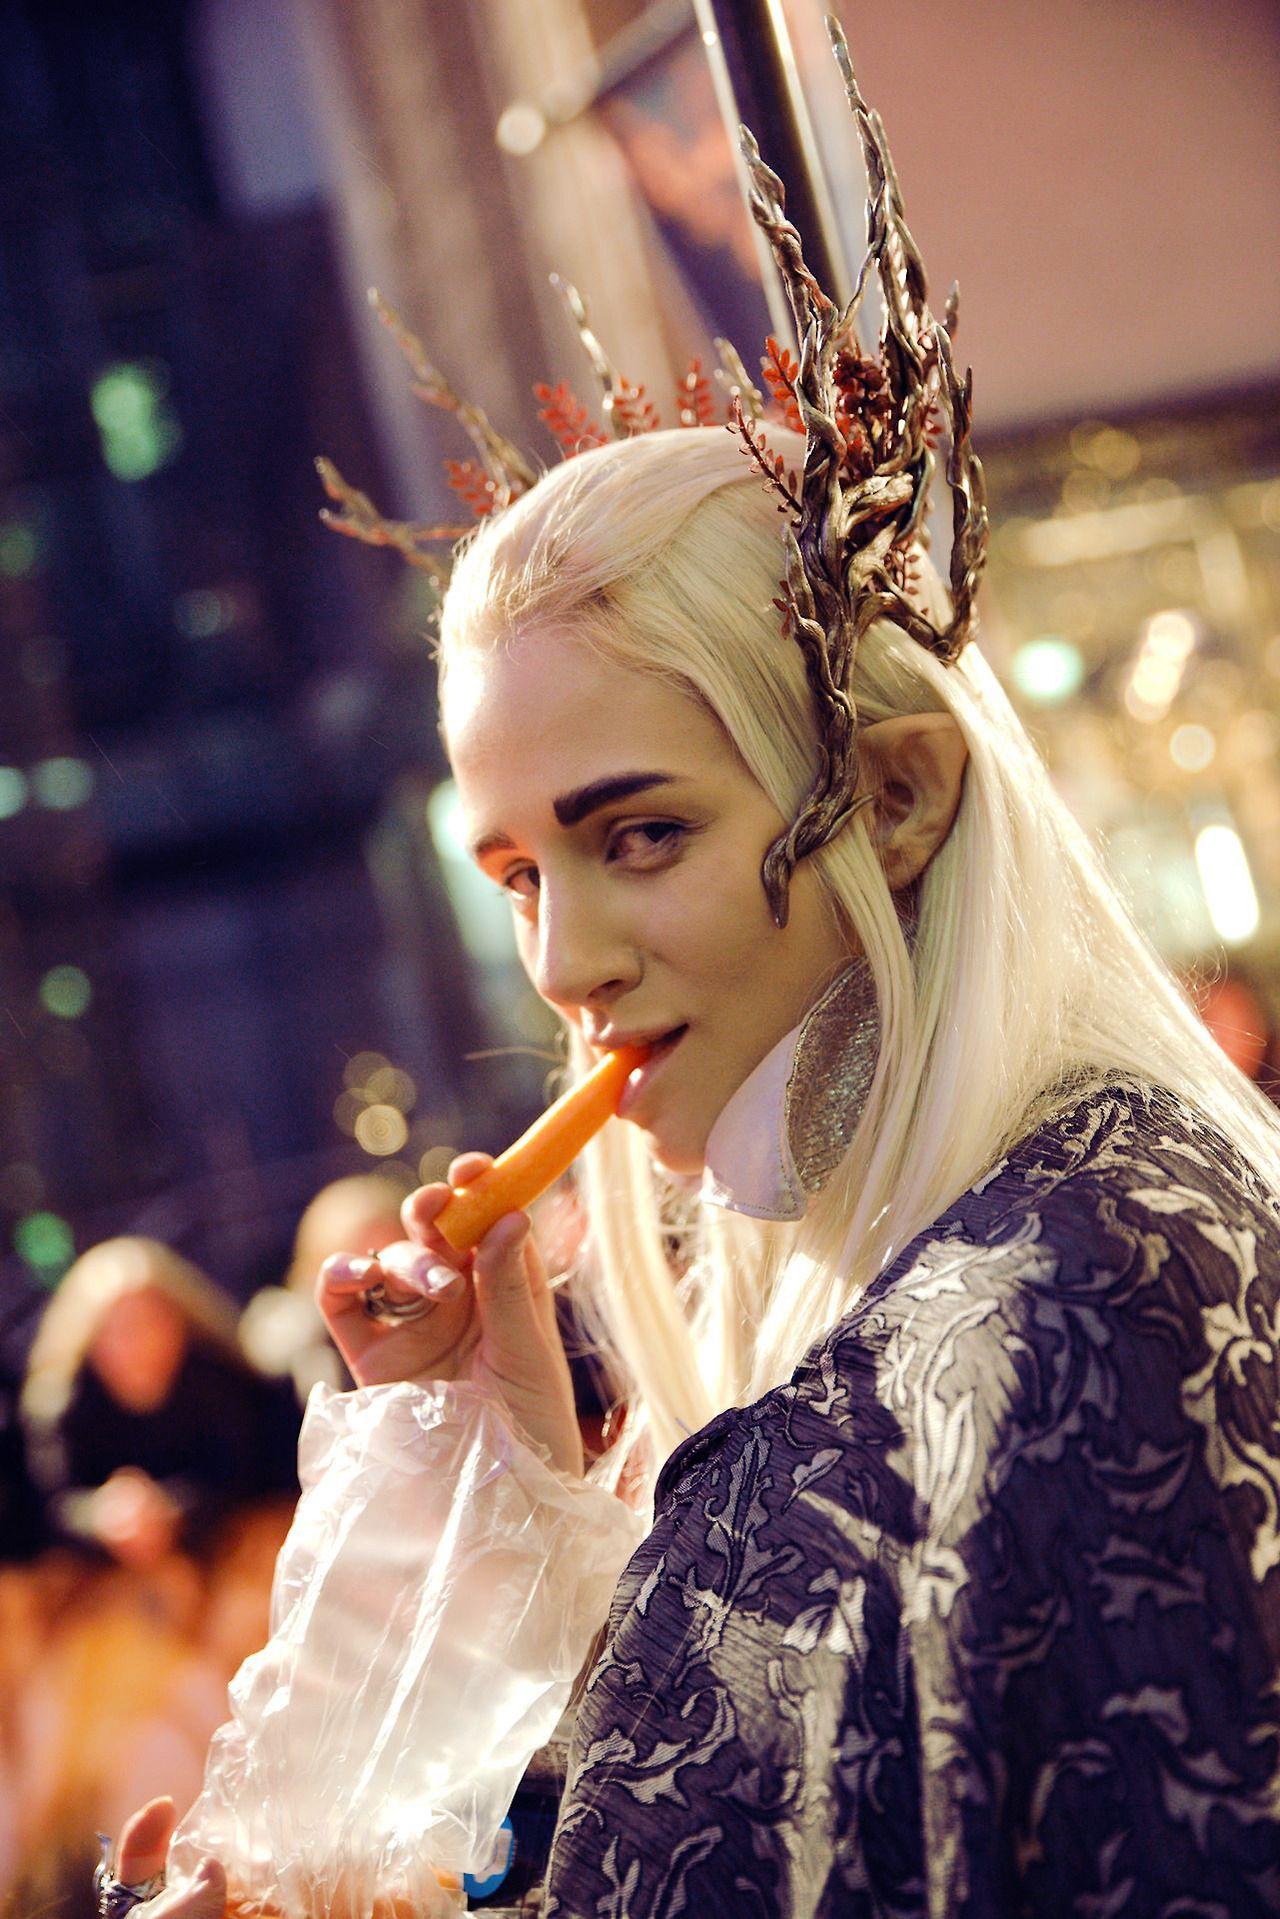 #Thranduil #Hobbit #Elf #Cosplay   Thranduil cosplay, Elf